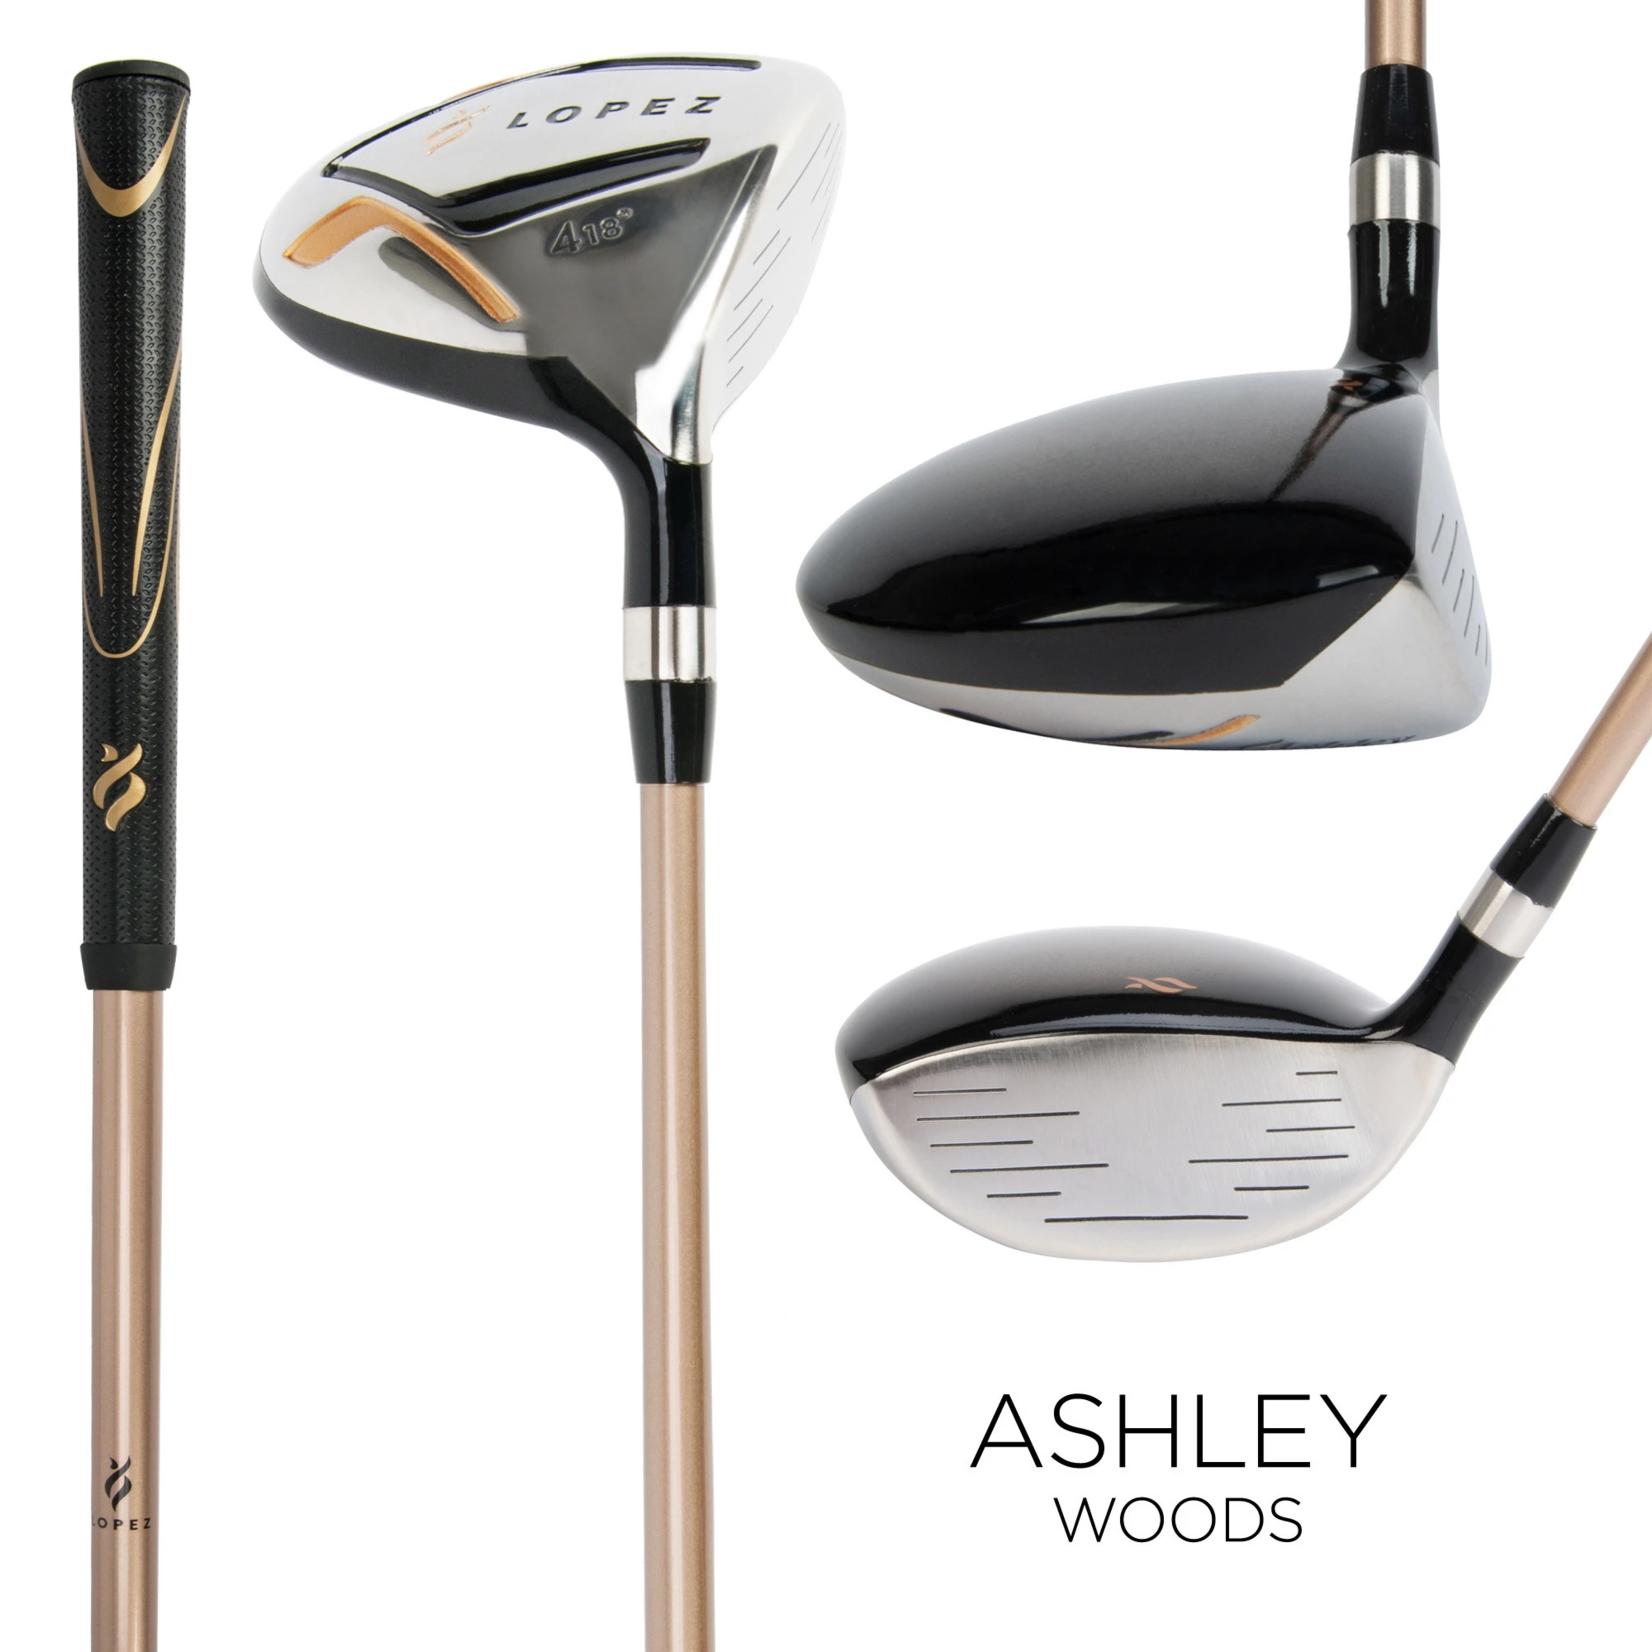 Lopez Golf Lopez Ashley Fairway Wood #4